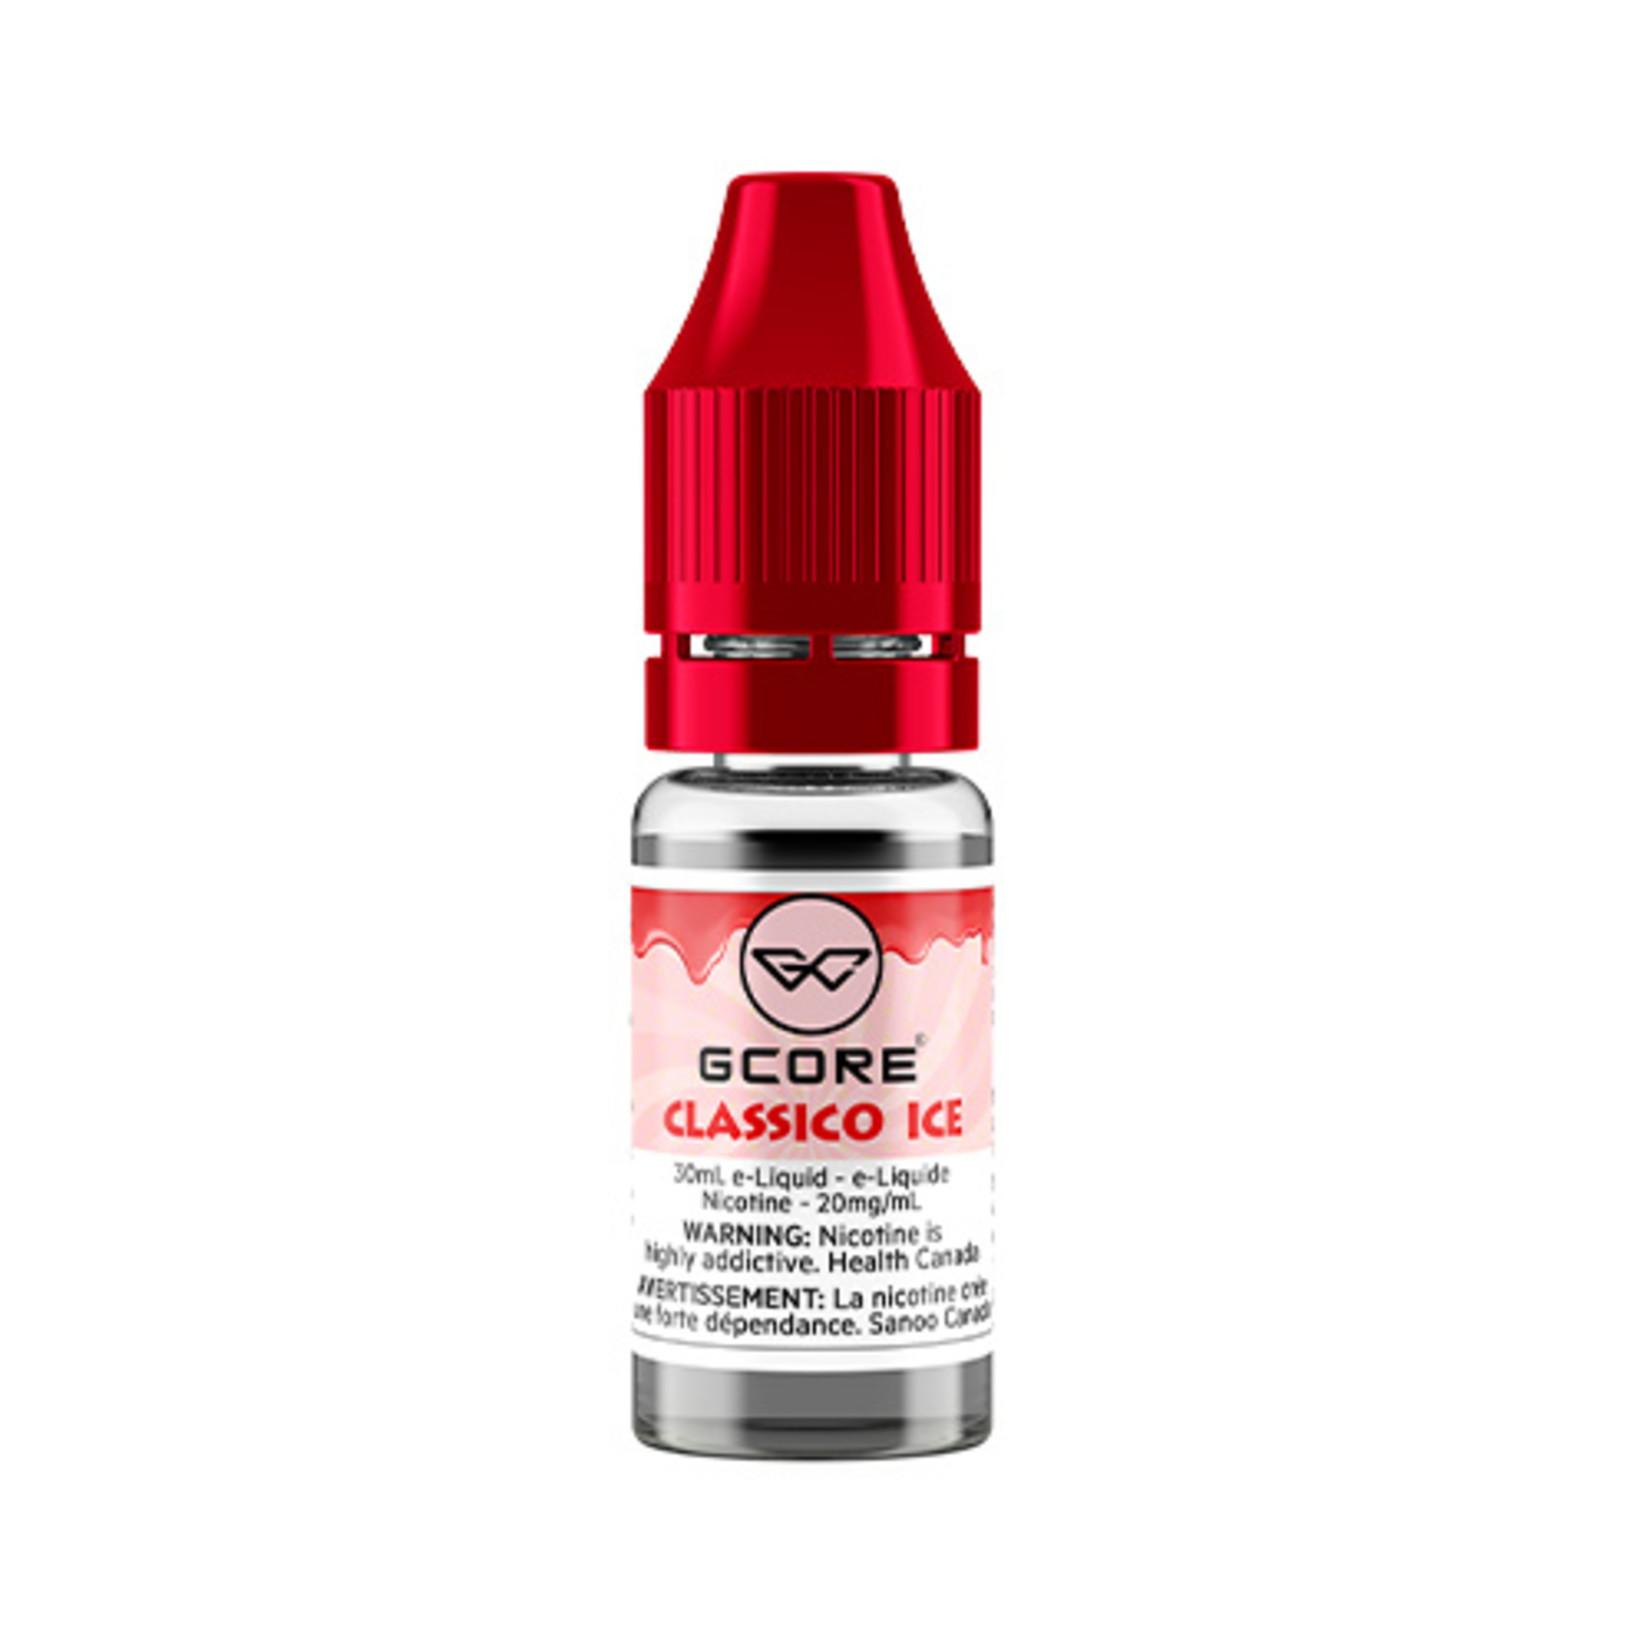 Gcore Vape Classico Ice Juice